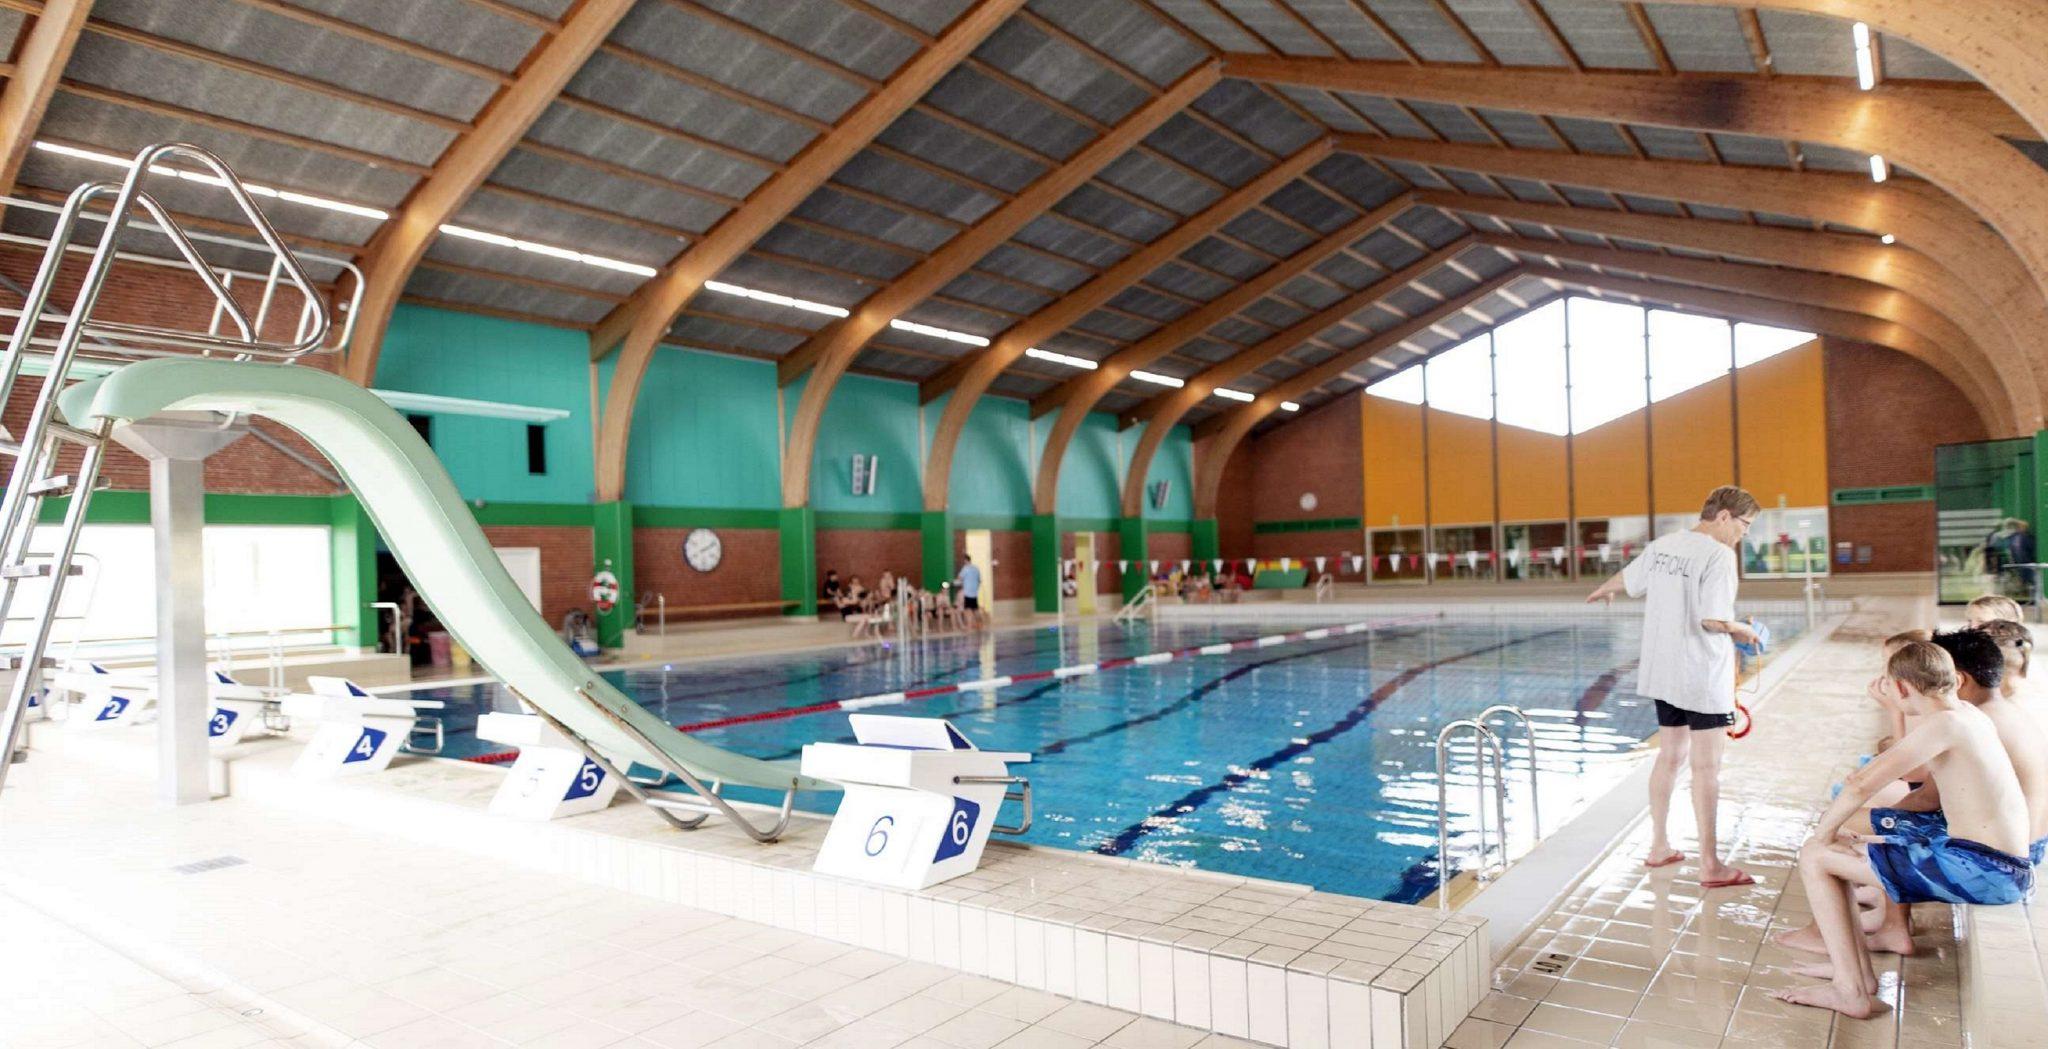 Nord-Als Sports Center